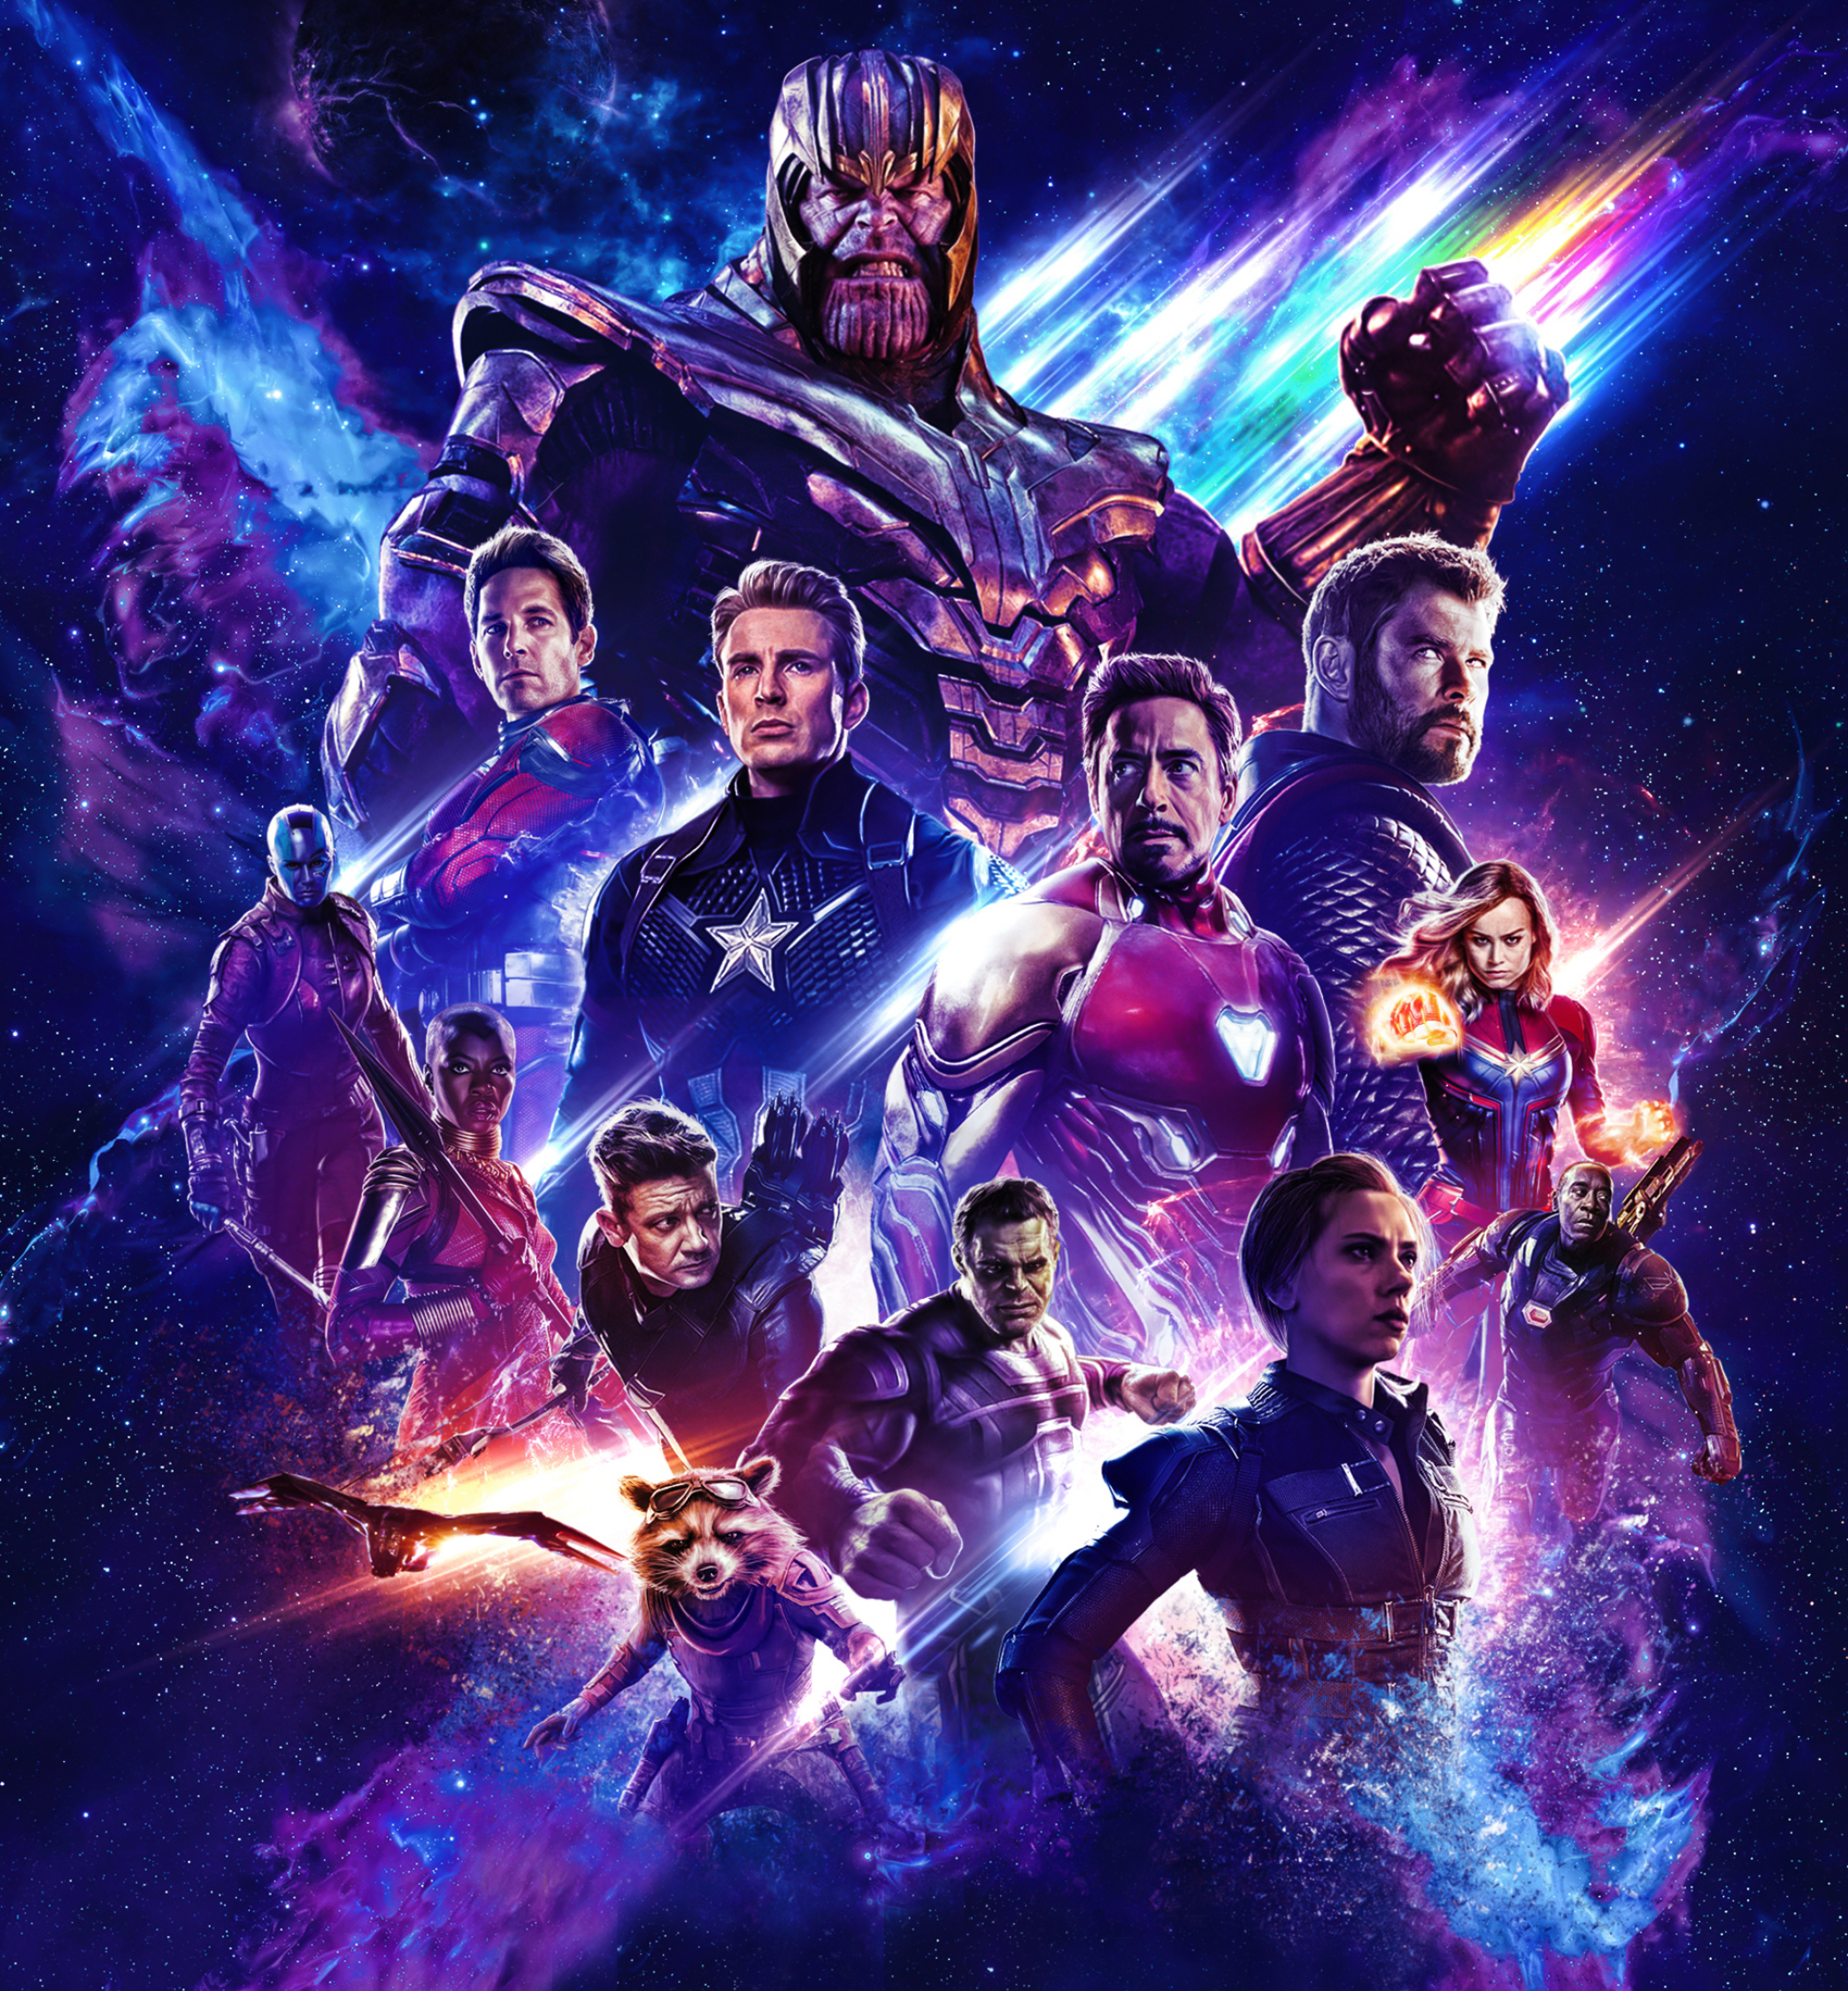 2088x2250 Avengers Endgame 2019 Movie 2088x2250 Resolution ...